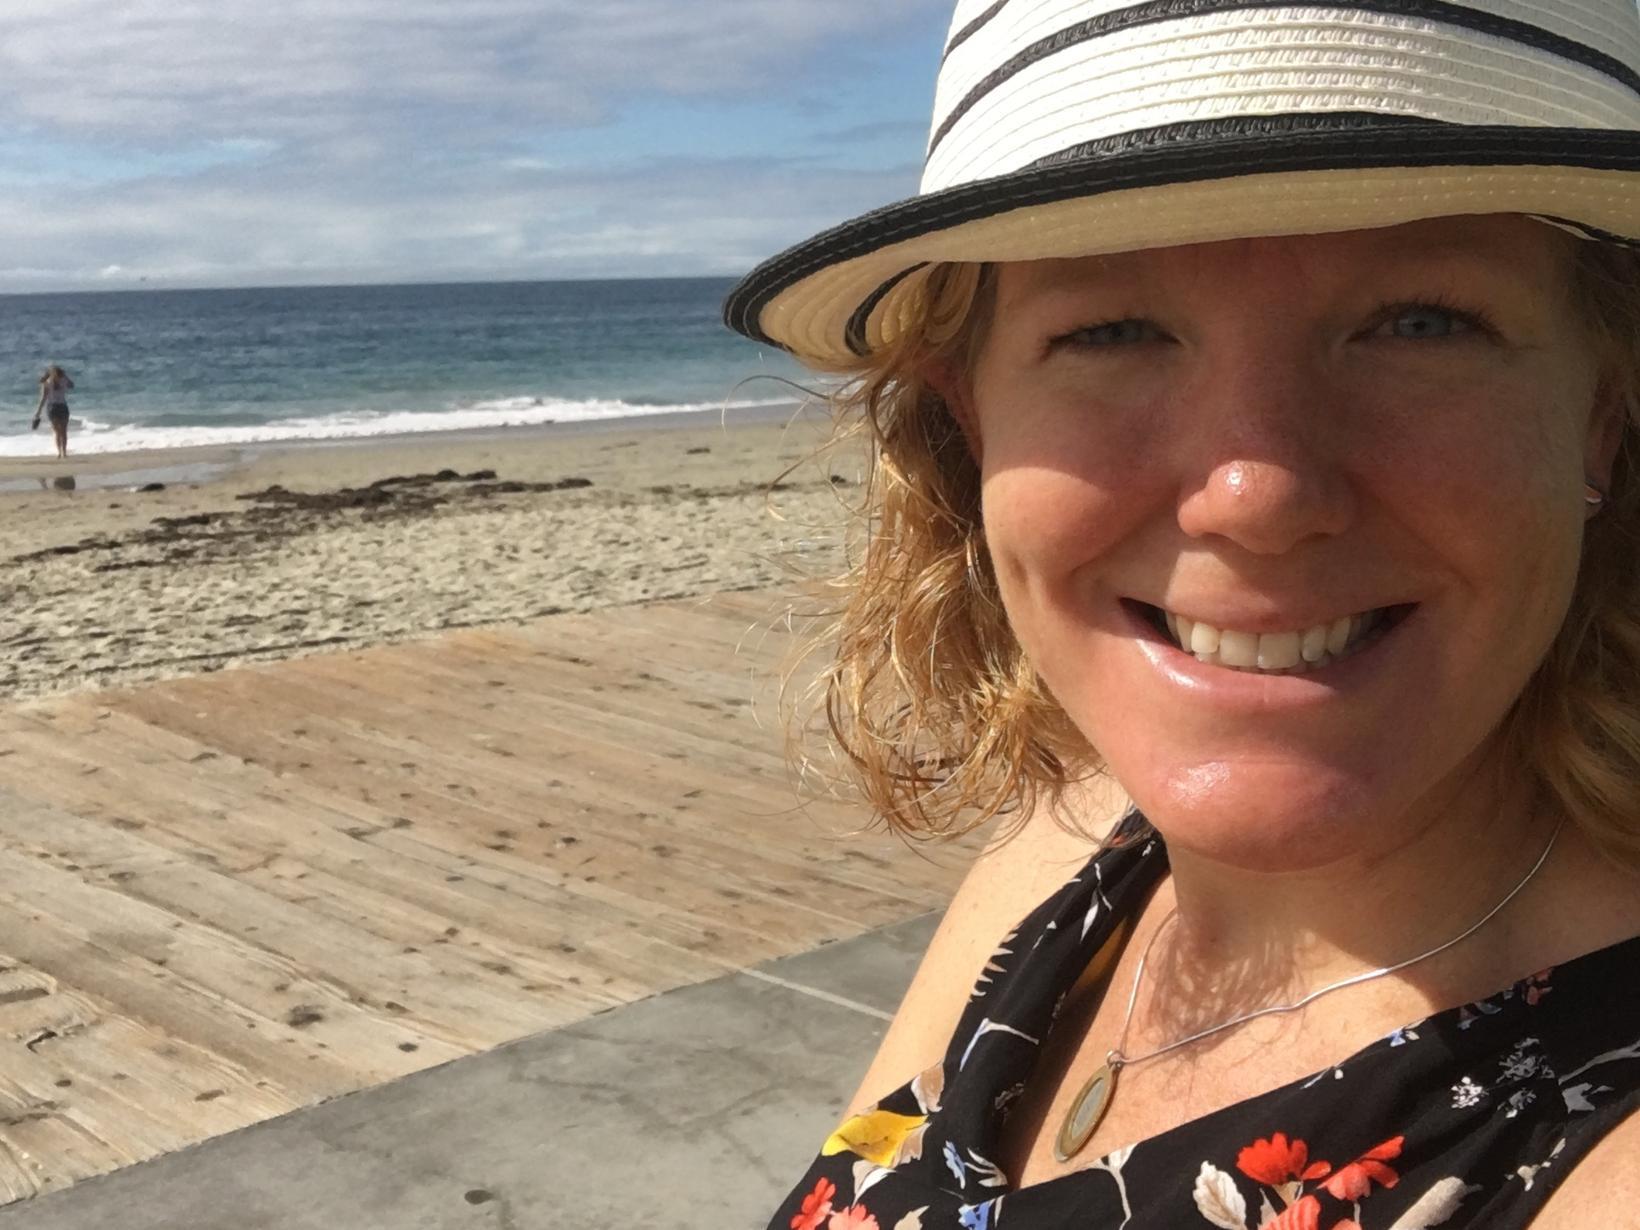 Andrea from Irvine, California, United States